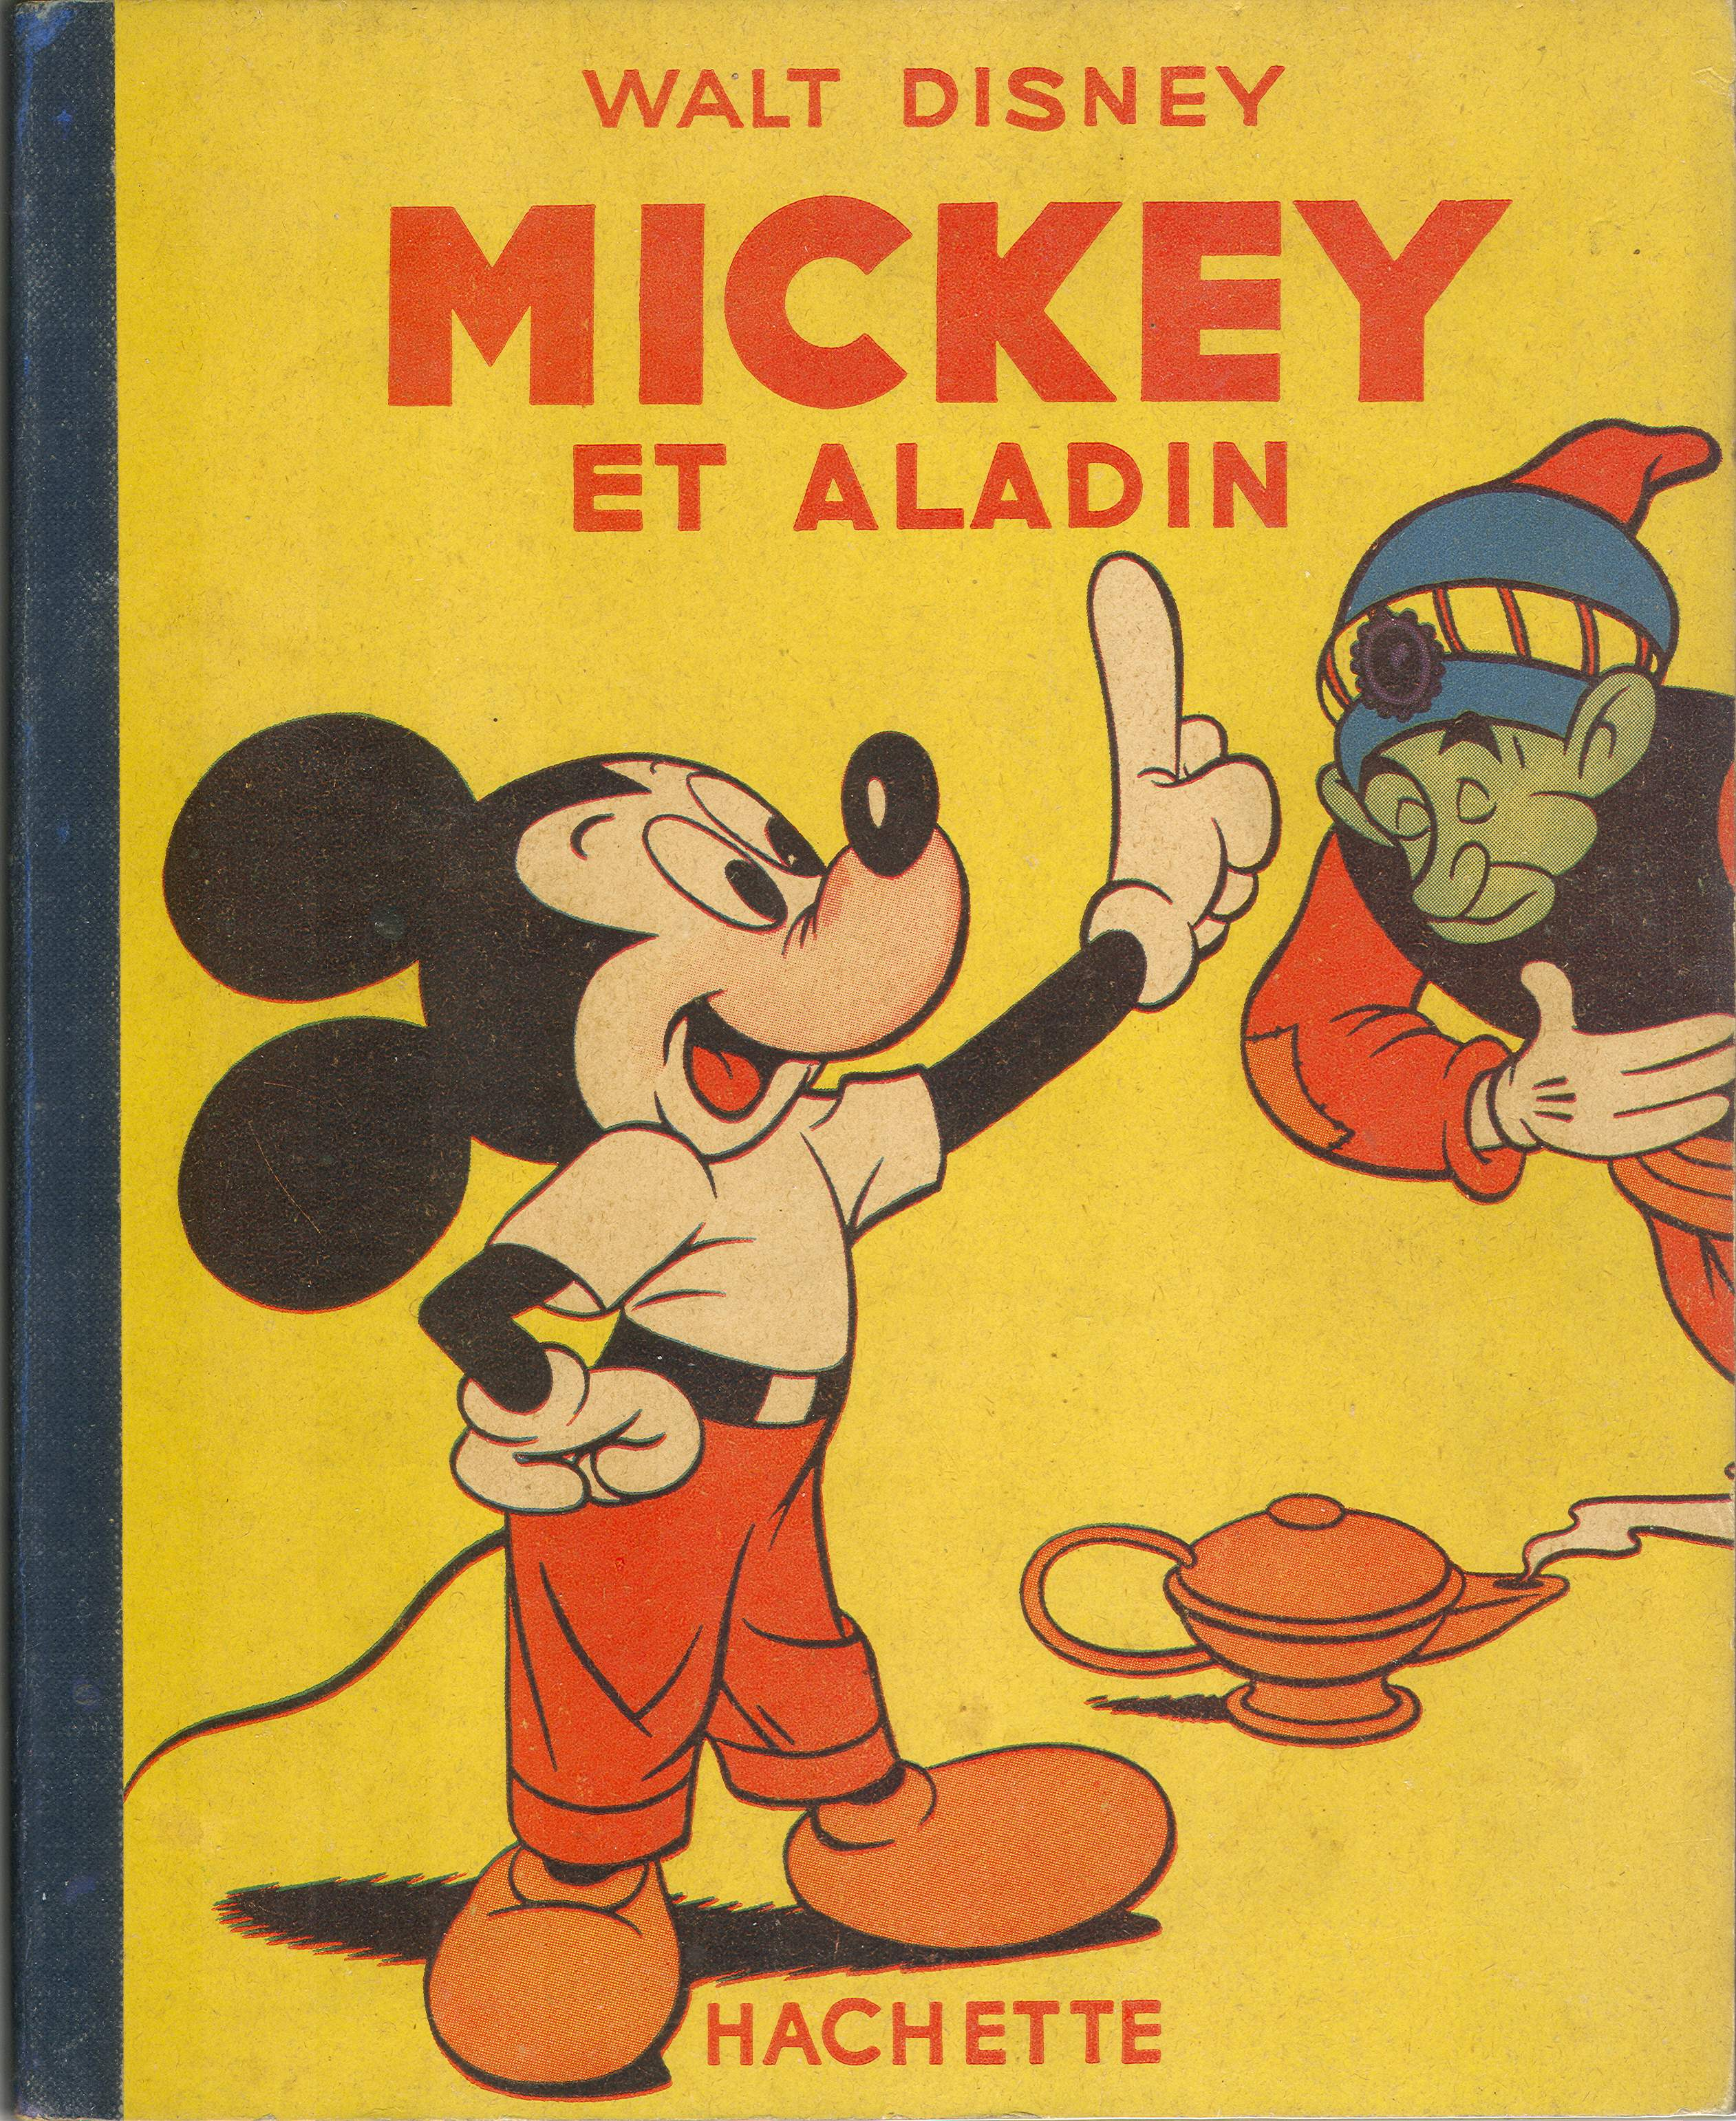 Mickey et la lampe d'Aladin